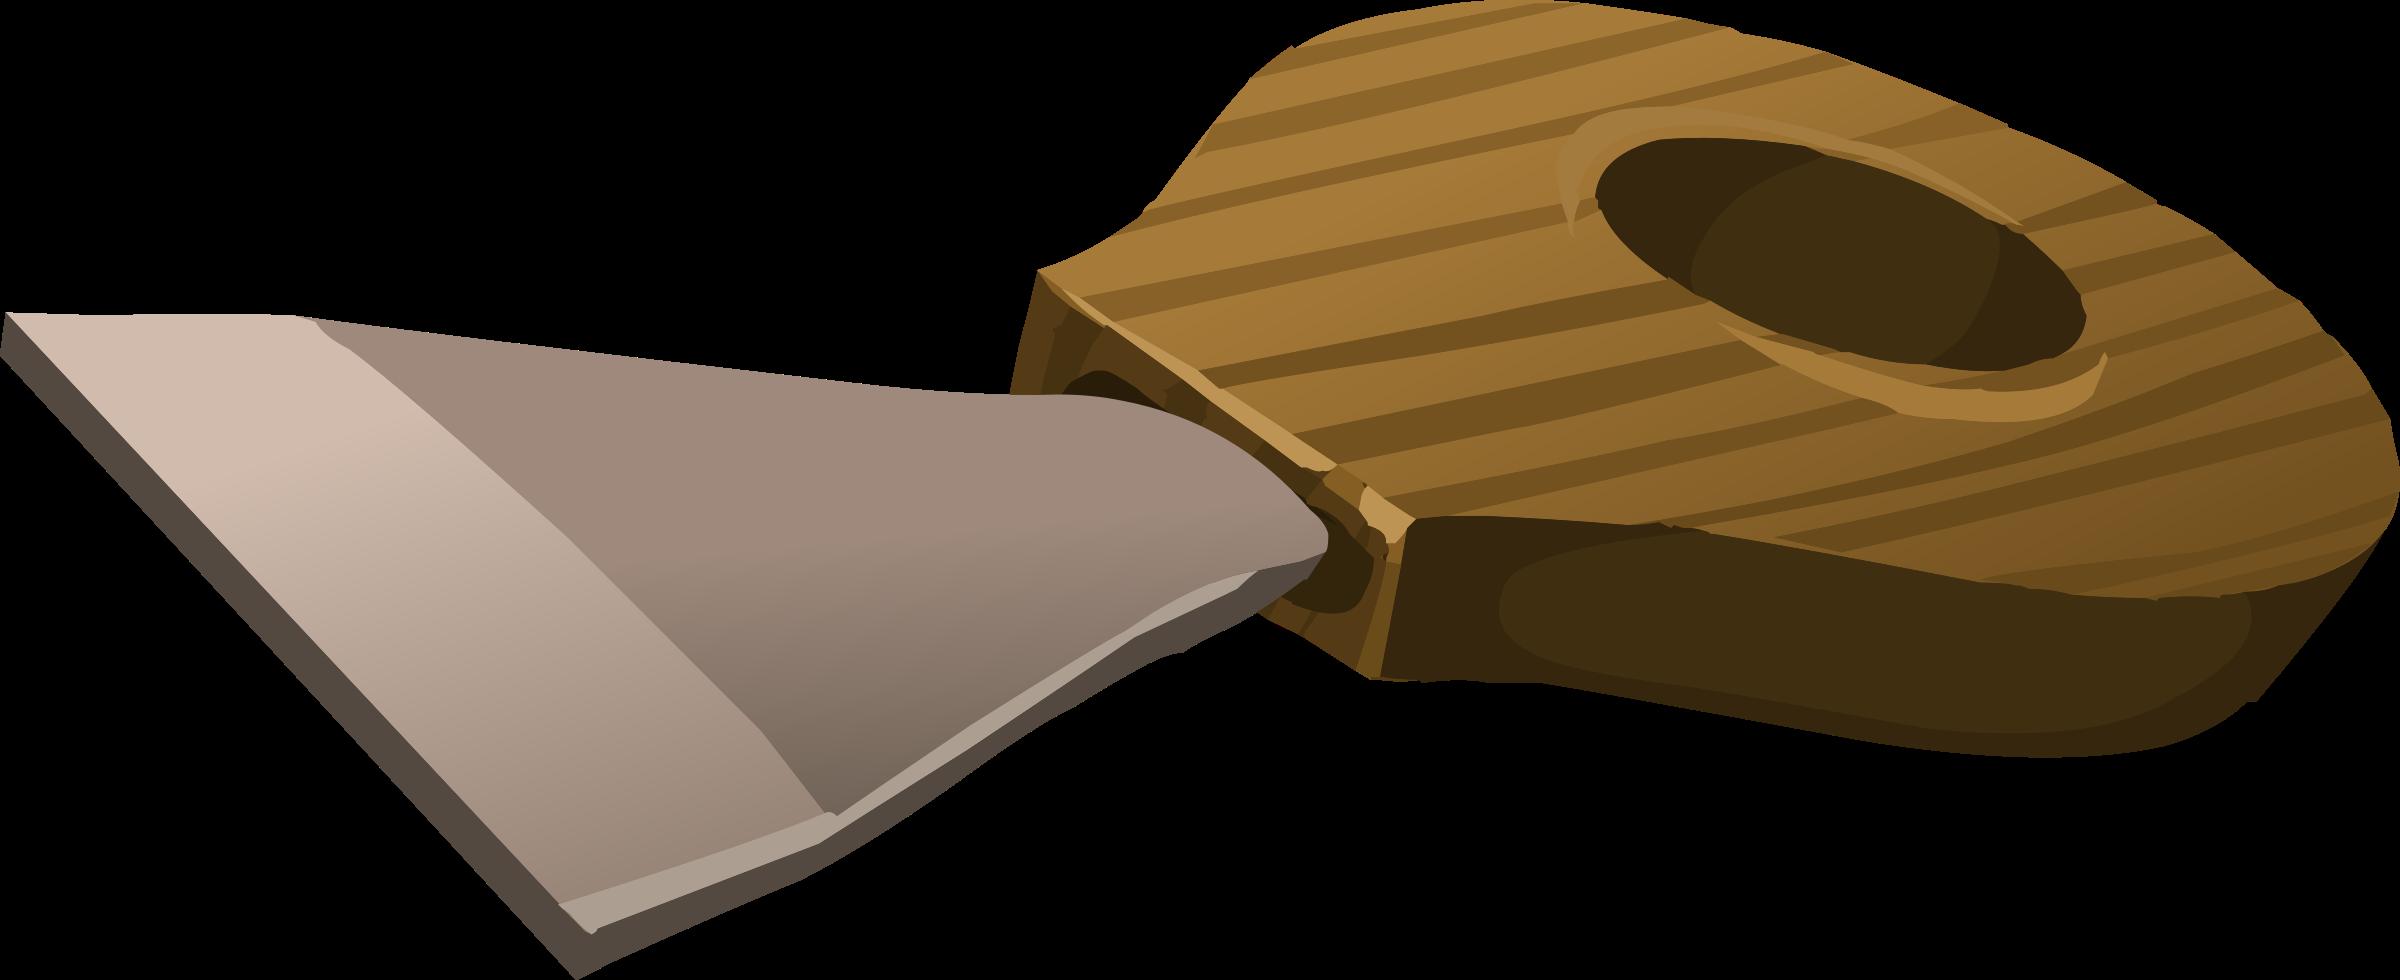 Hammer clipart design technology tool. Tools scraper icons png